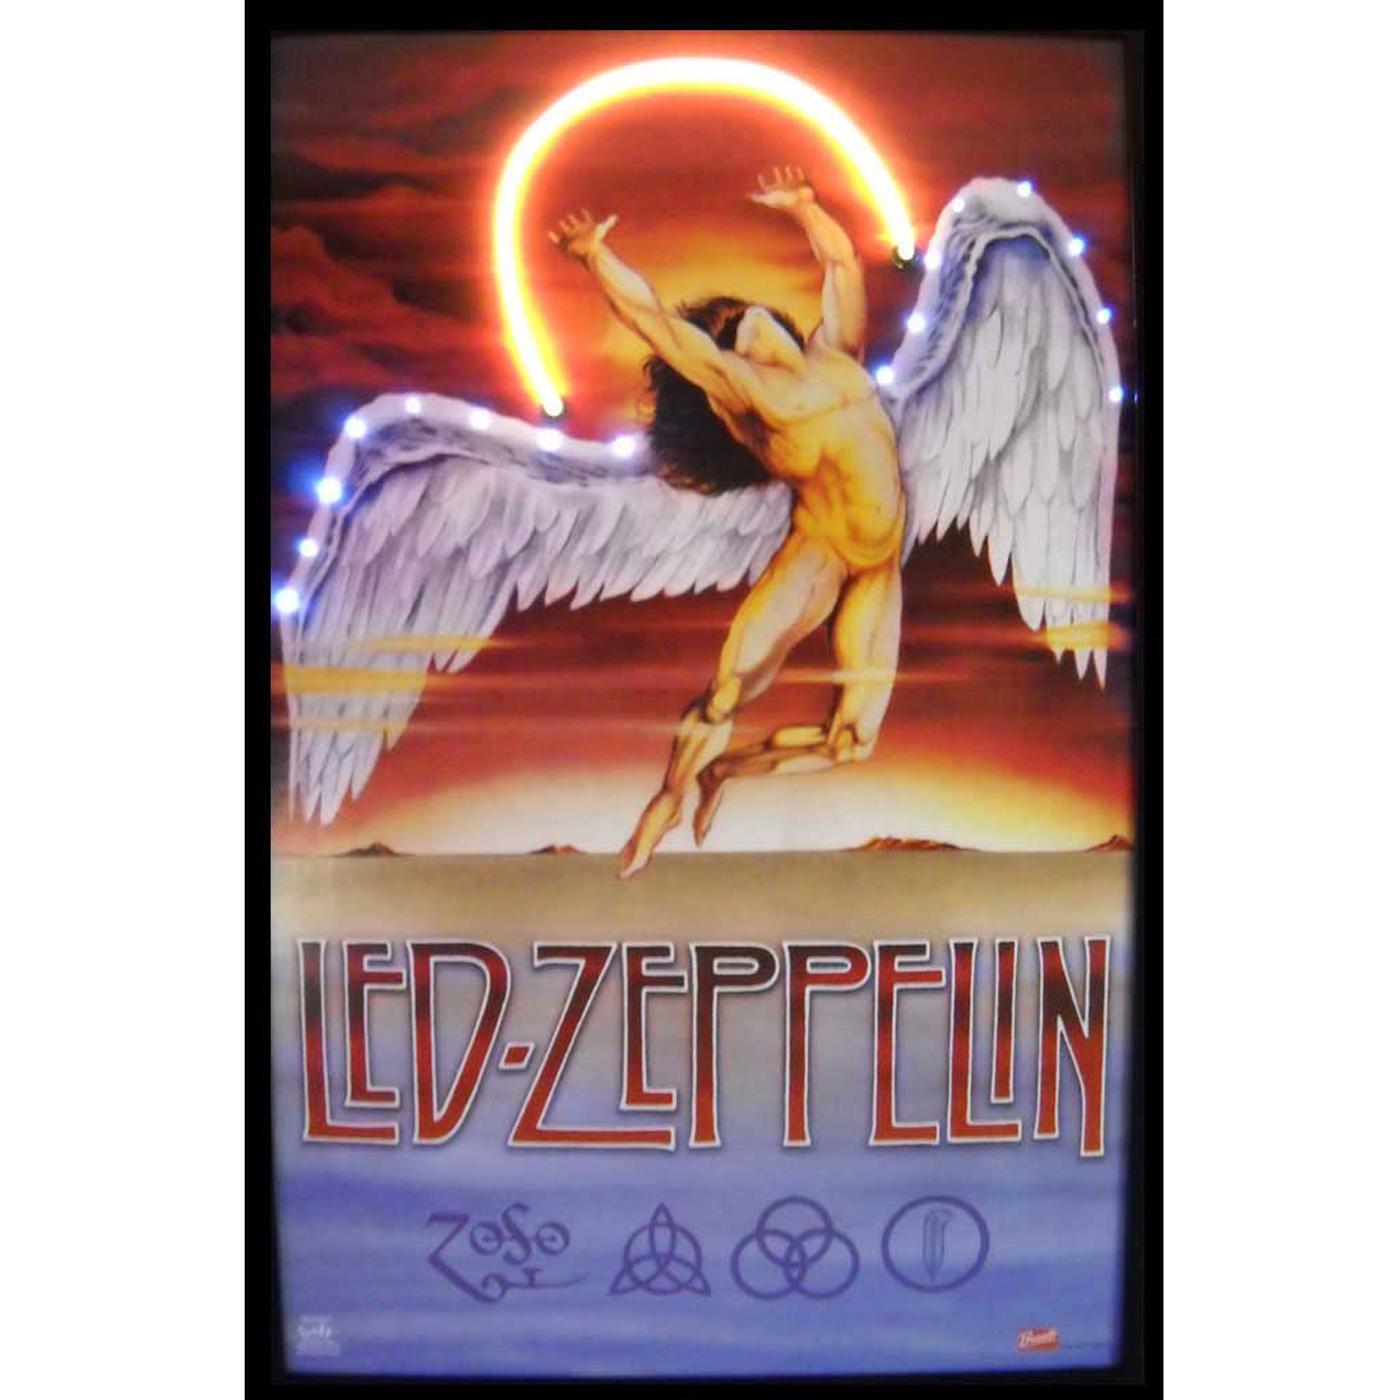 Led Zeppelin Neon LED Art Picture By Neonetics In Neon